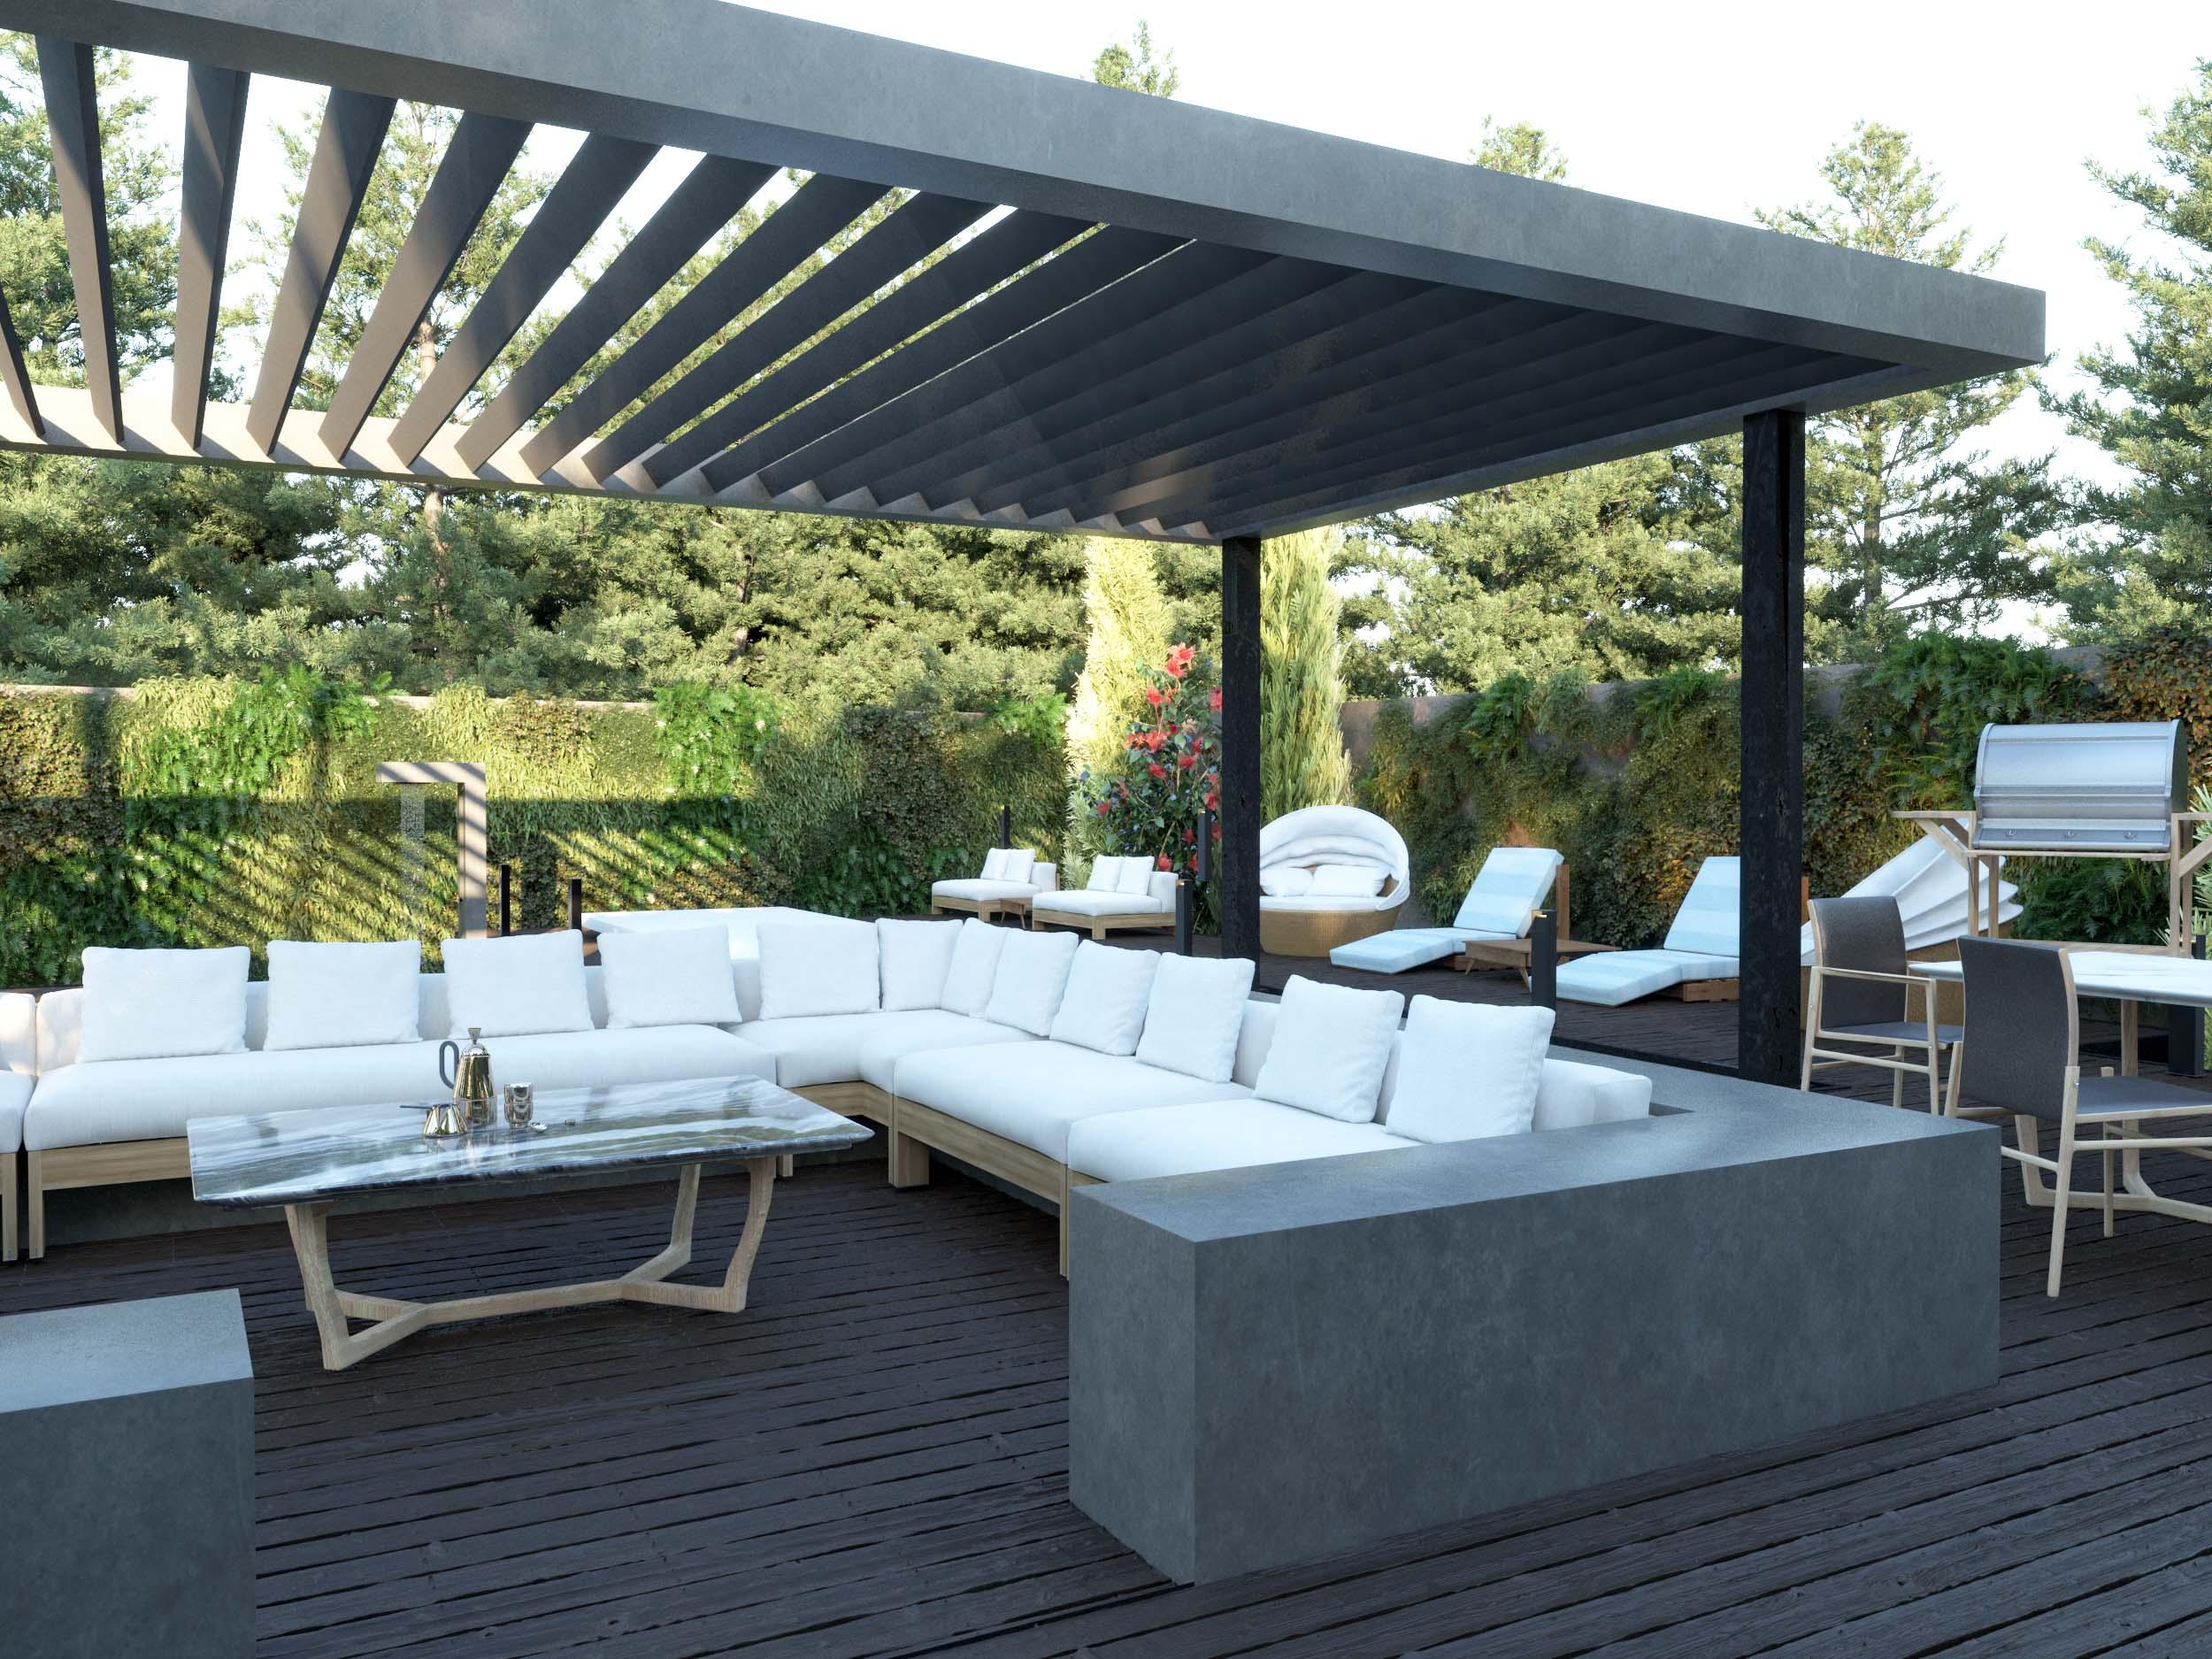 sitting area - garden - water - sun shading - roof design